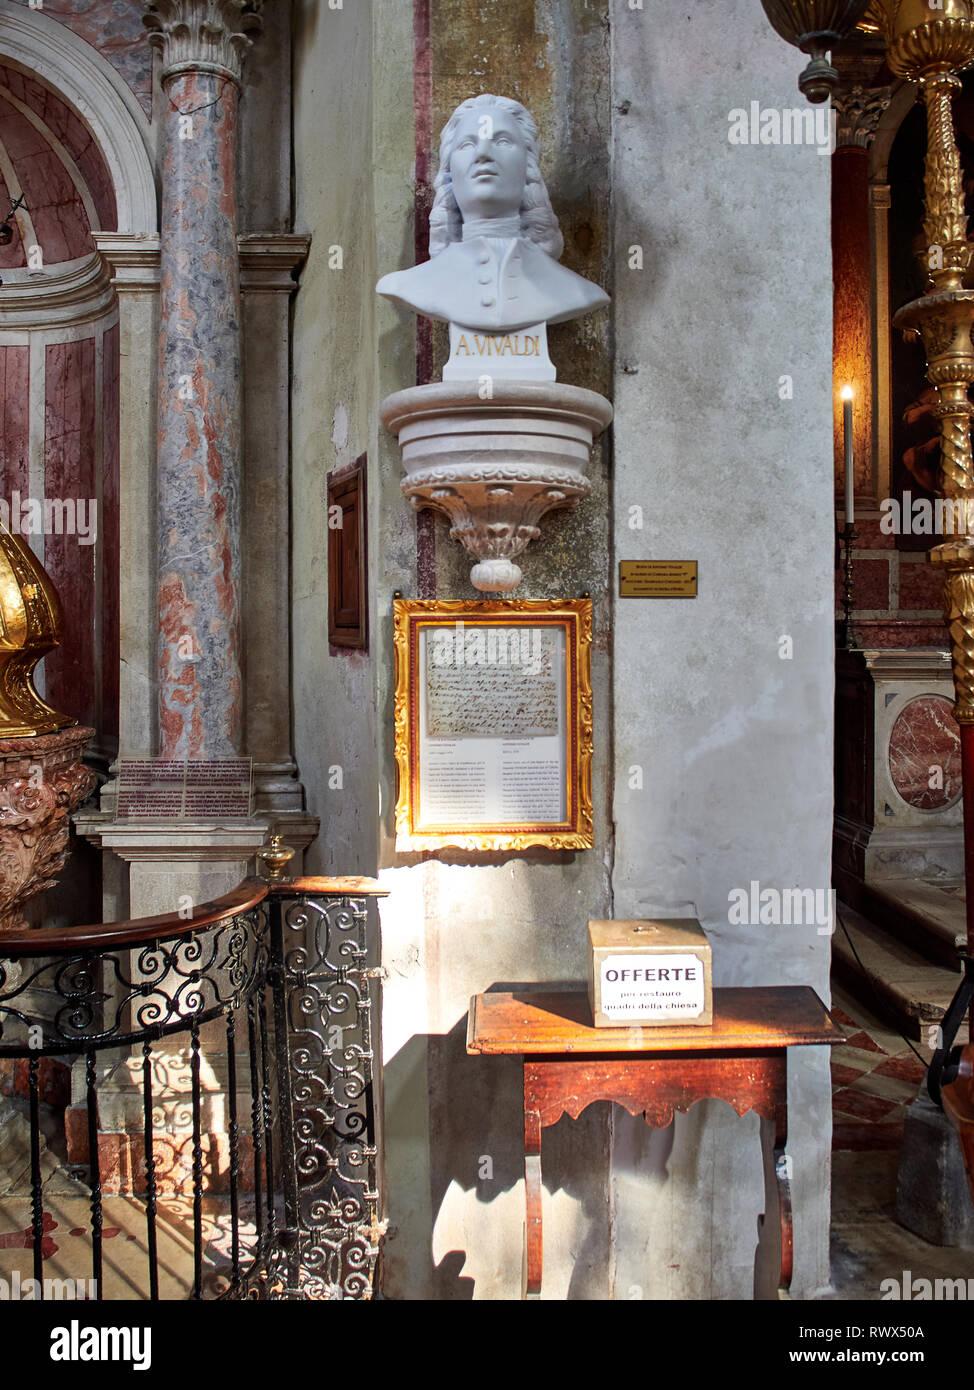 Venice, Italy - March 2, 2019 Bust of Vivaldi in Carrara Marble inside of San Giovanni in Bragora Church. - Stock Image